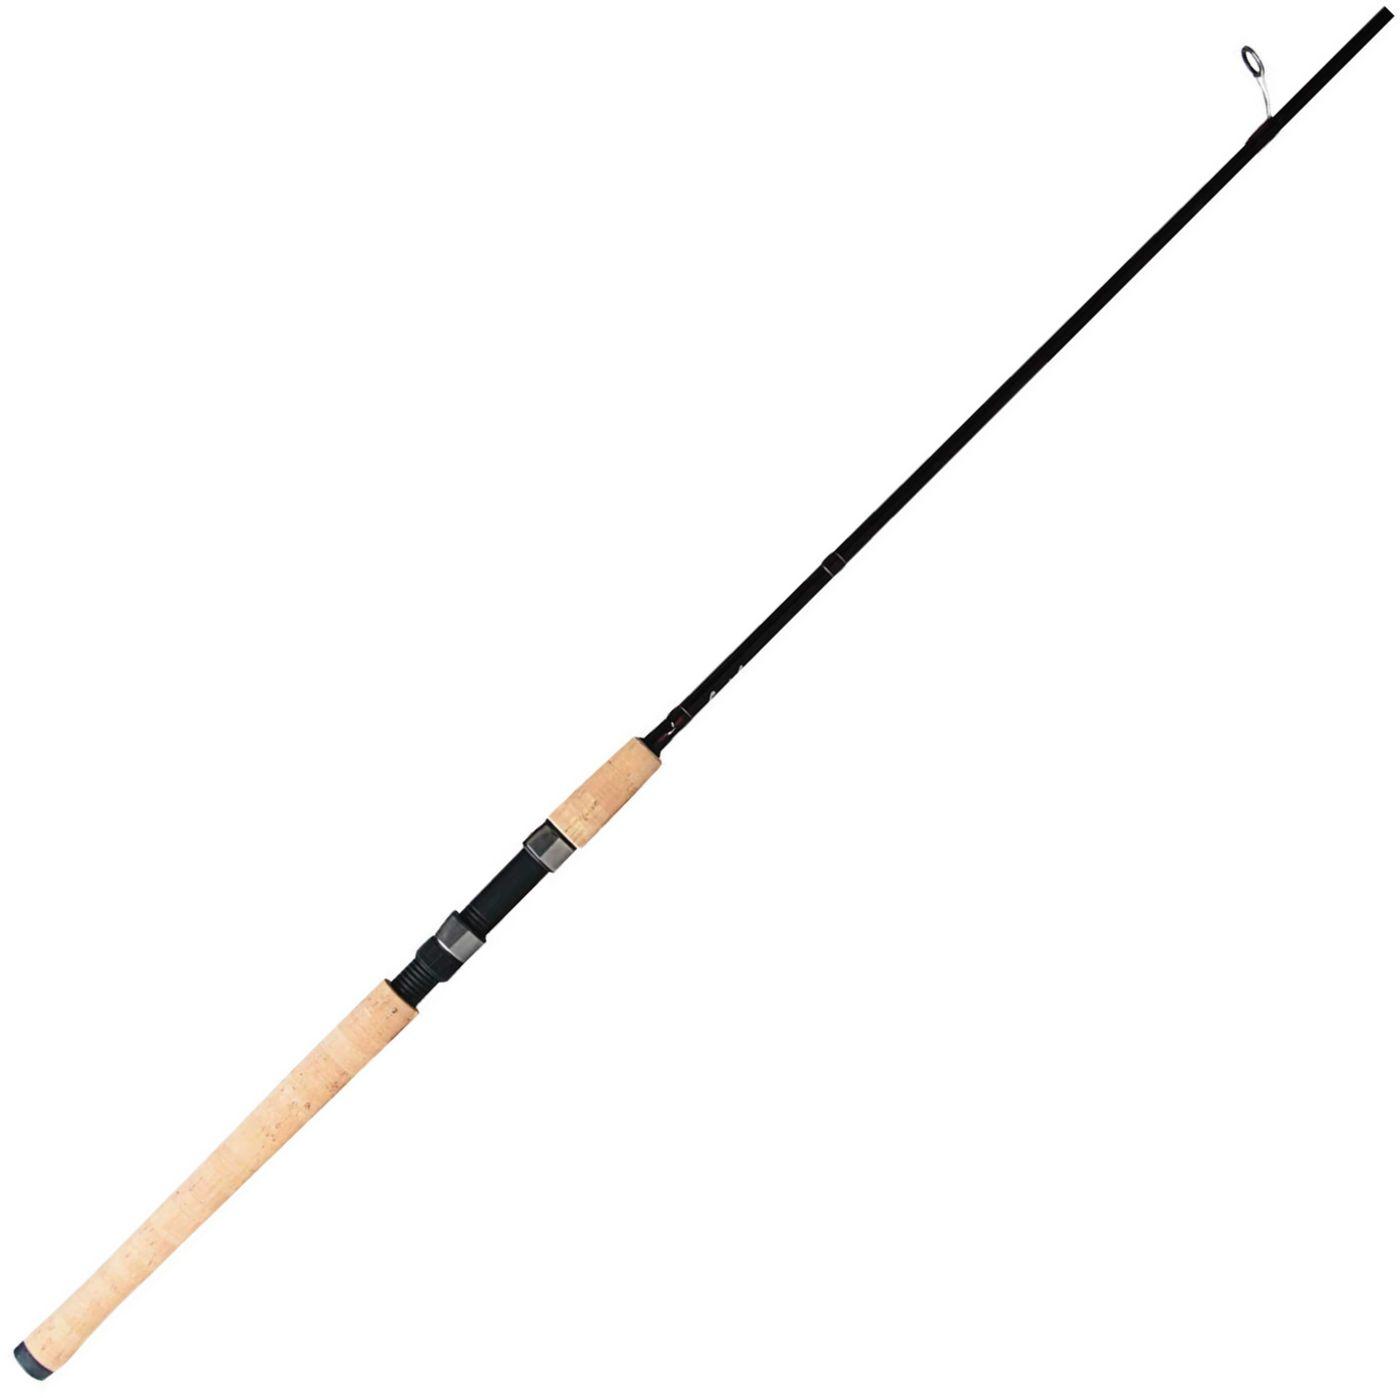 Lamiglas X-11 Salmon/Steelhead 2-Piece Spinning Rods